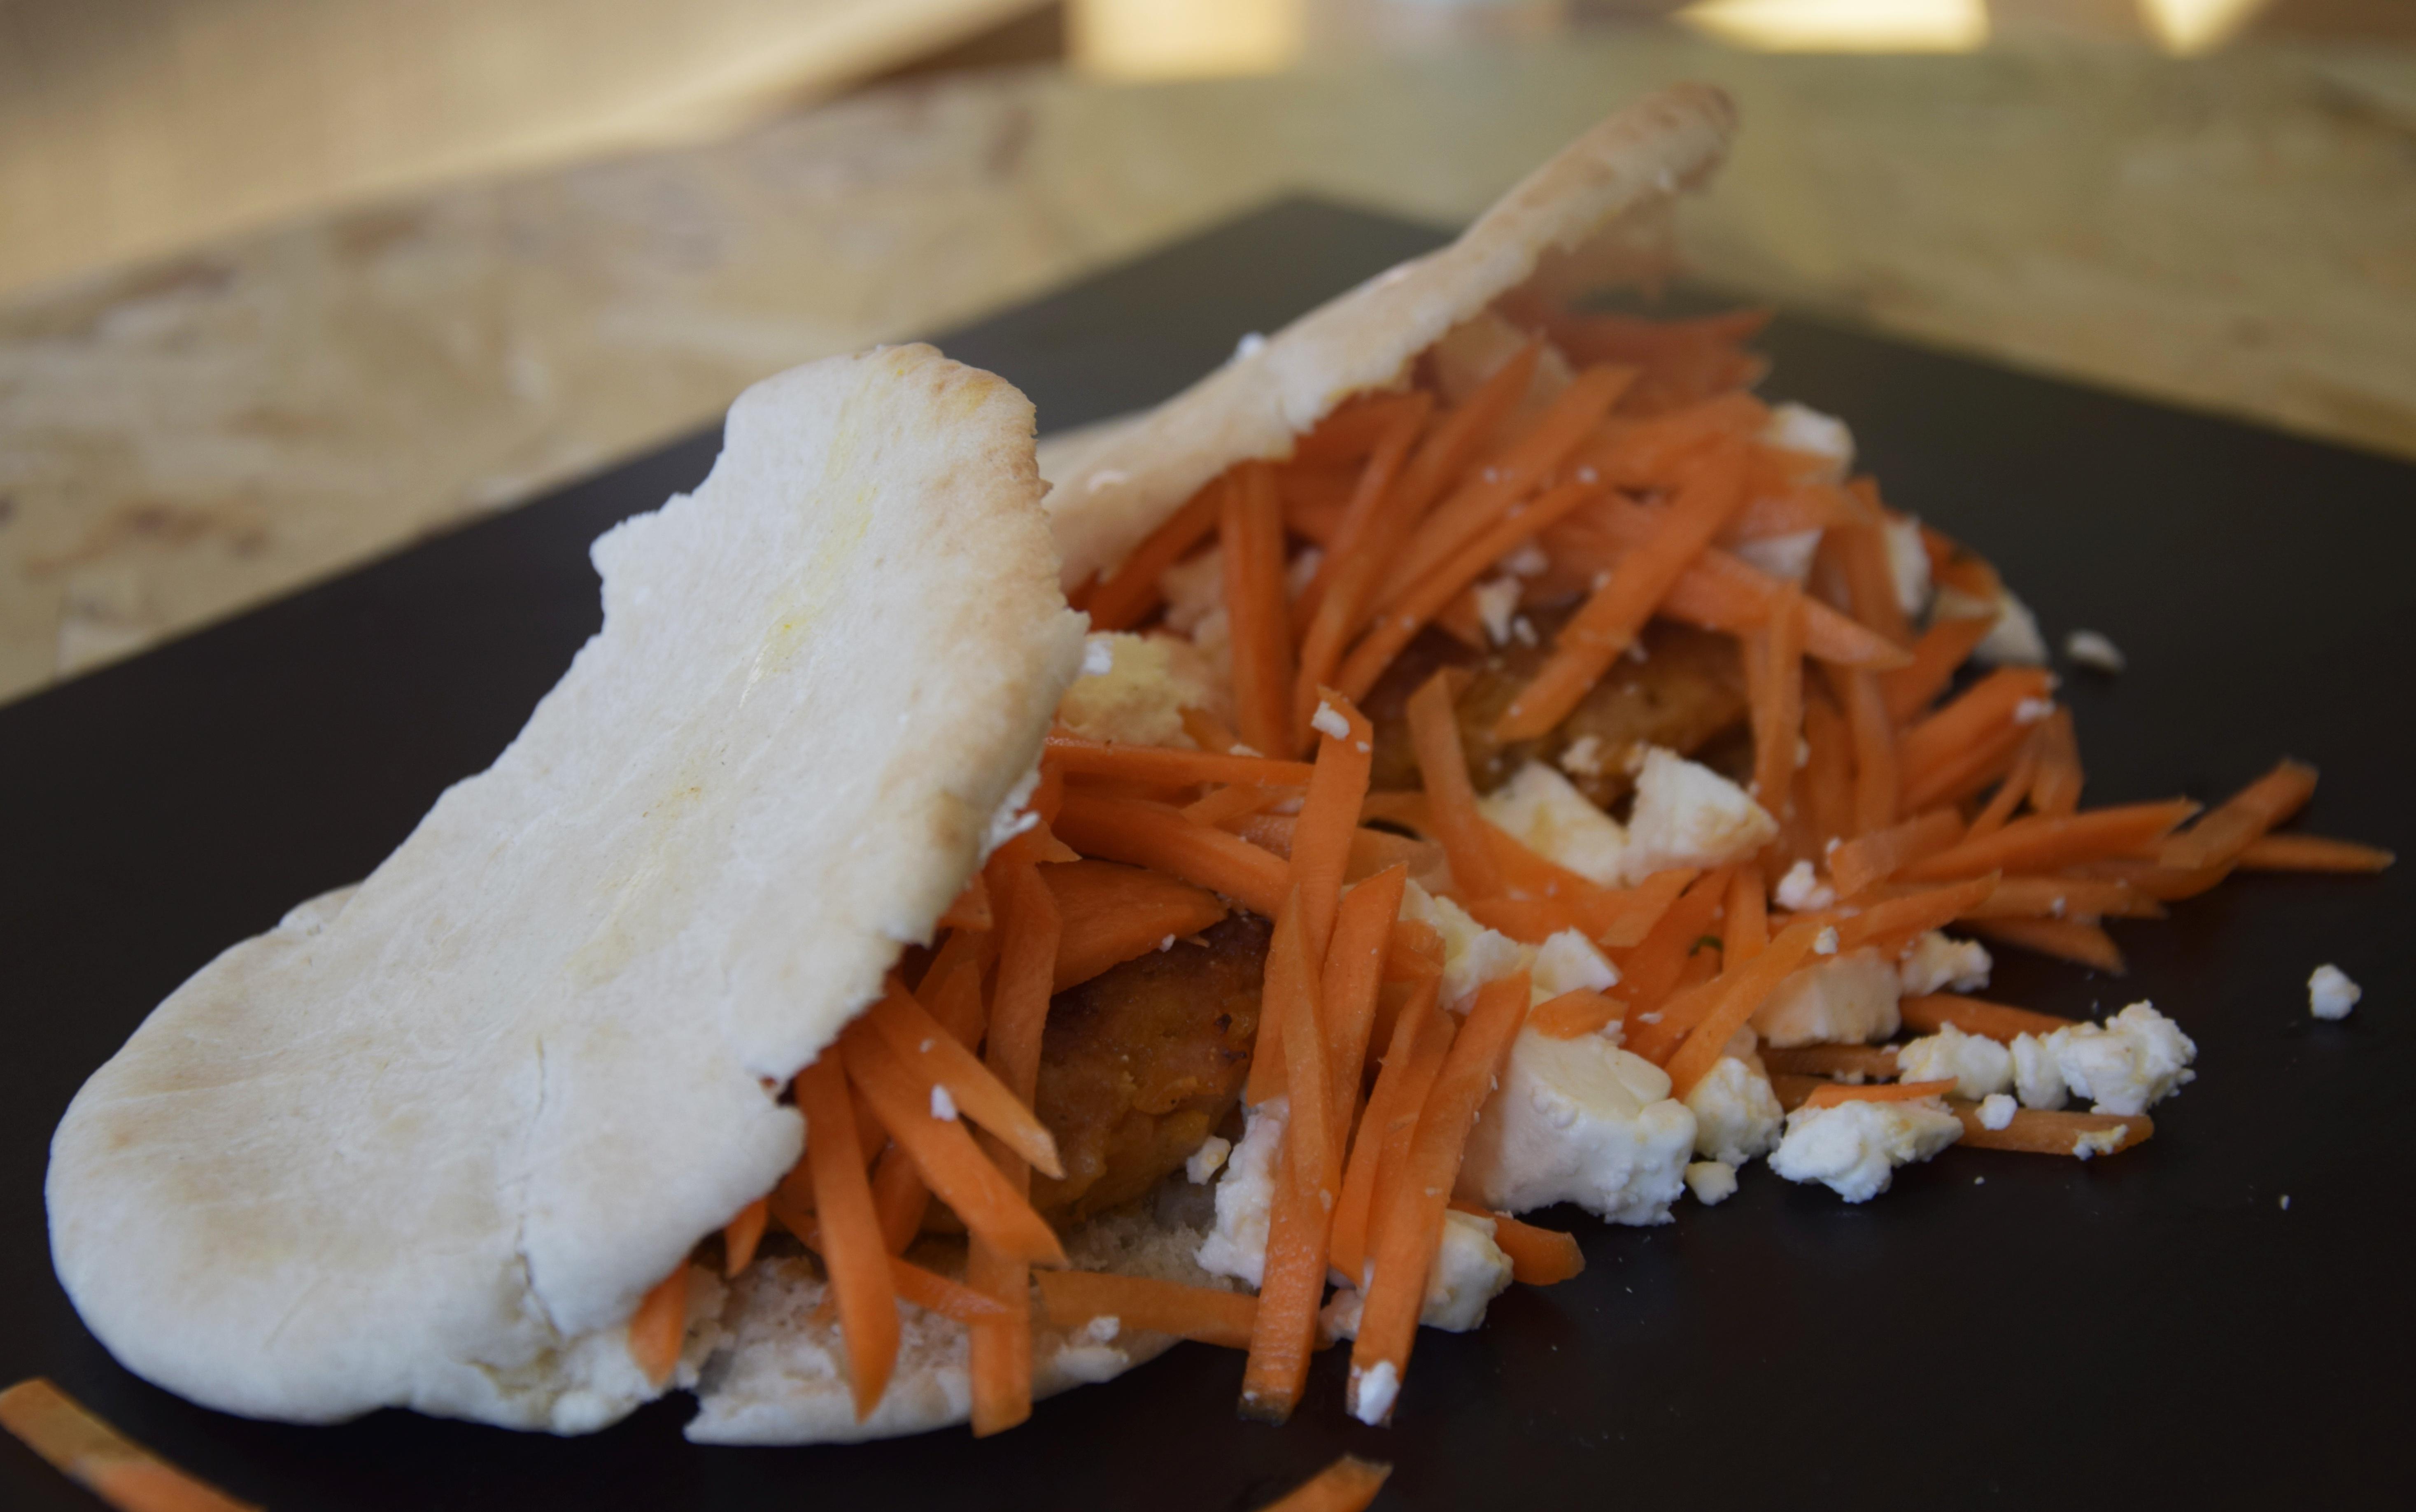 Marokko | Kippenburgers met feta en wortelsla